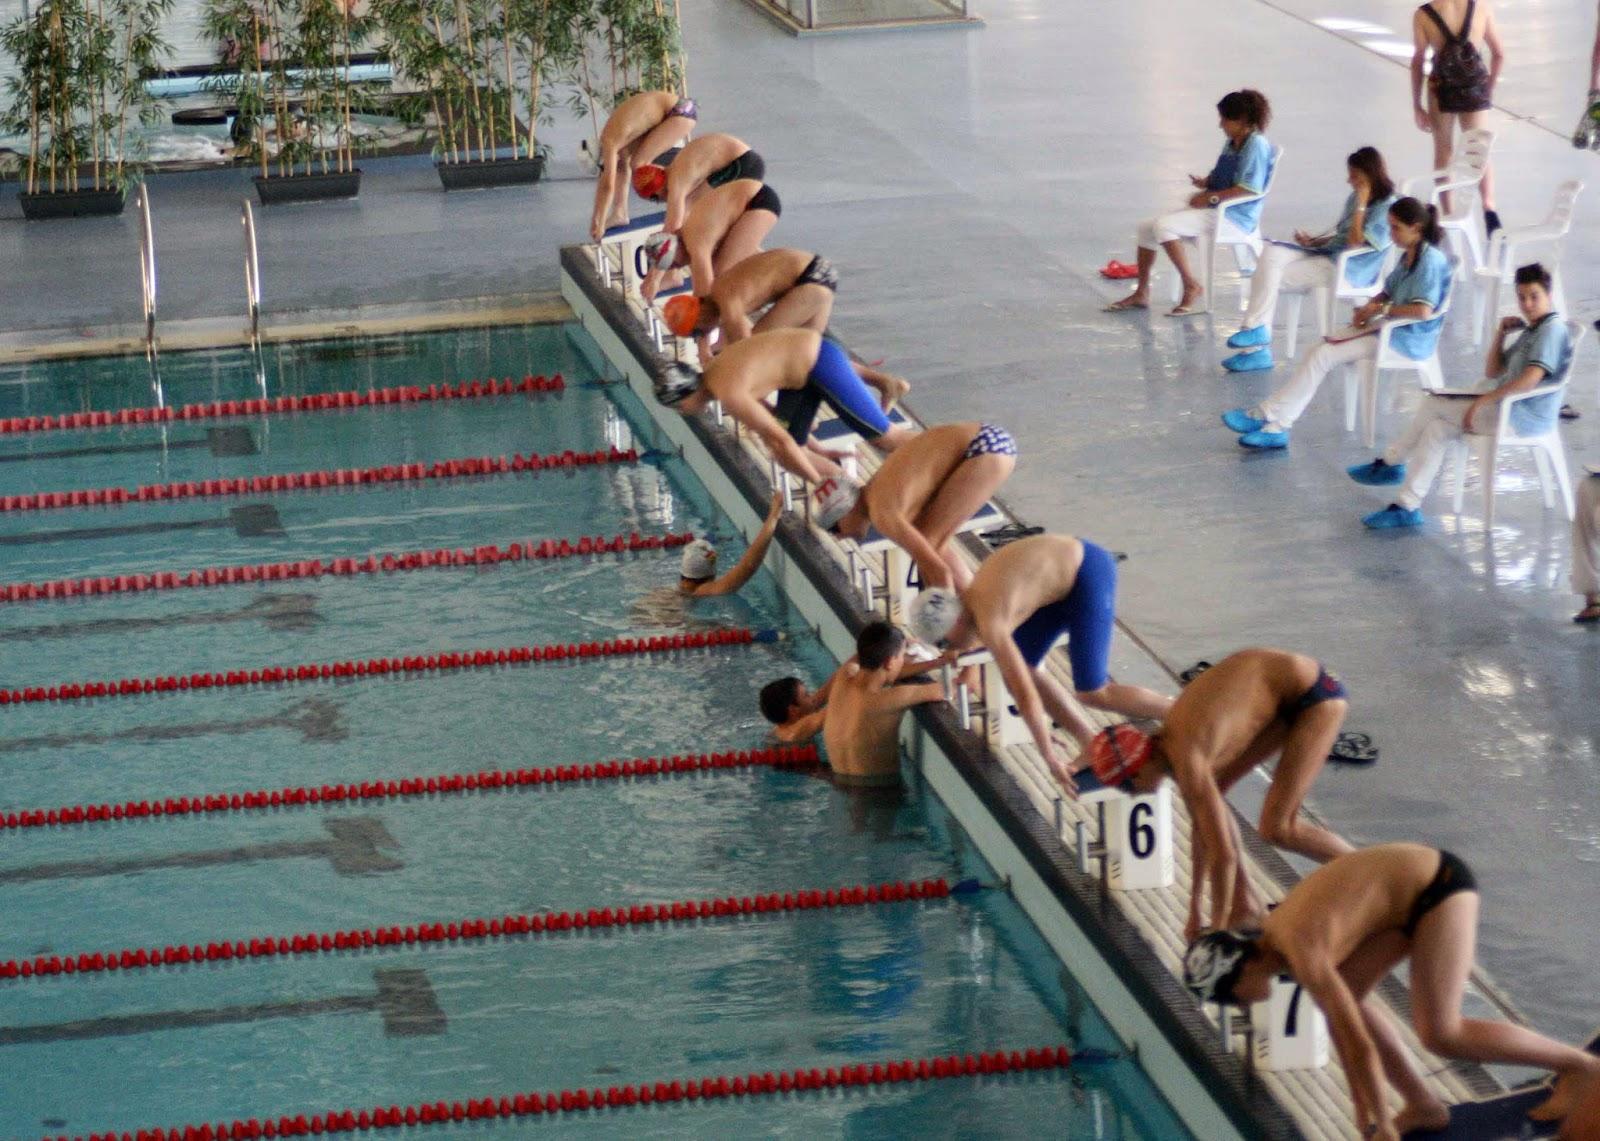 natacionantequera-natacion-antequera-natacion antequera